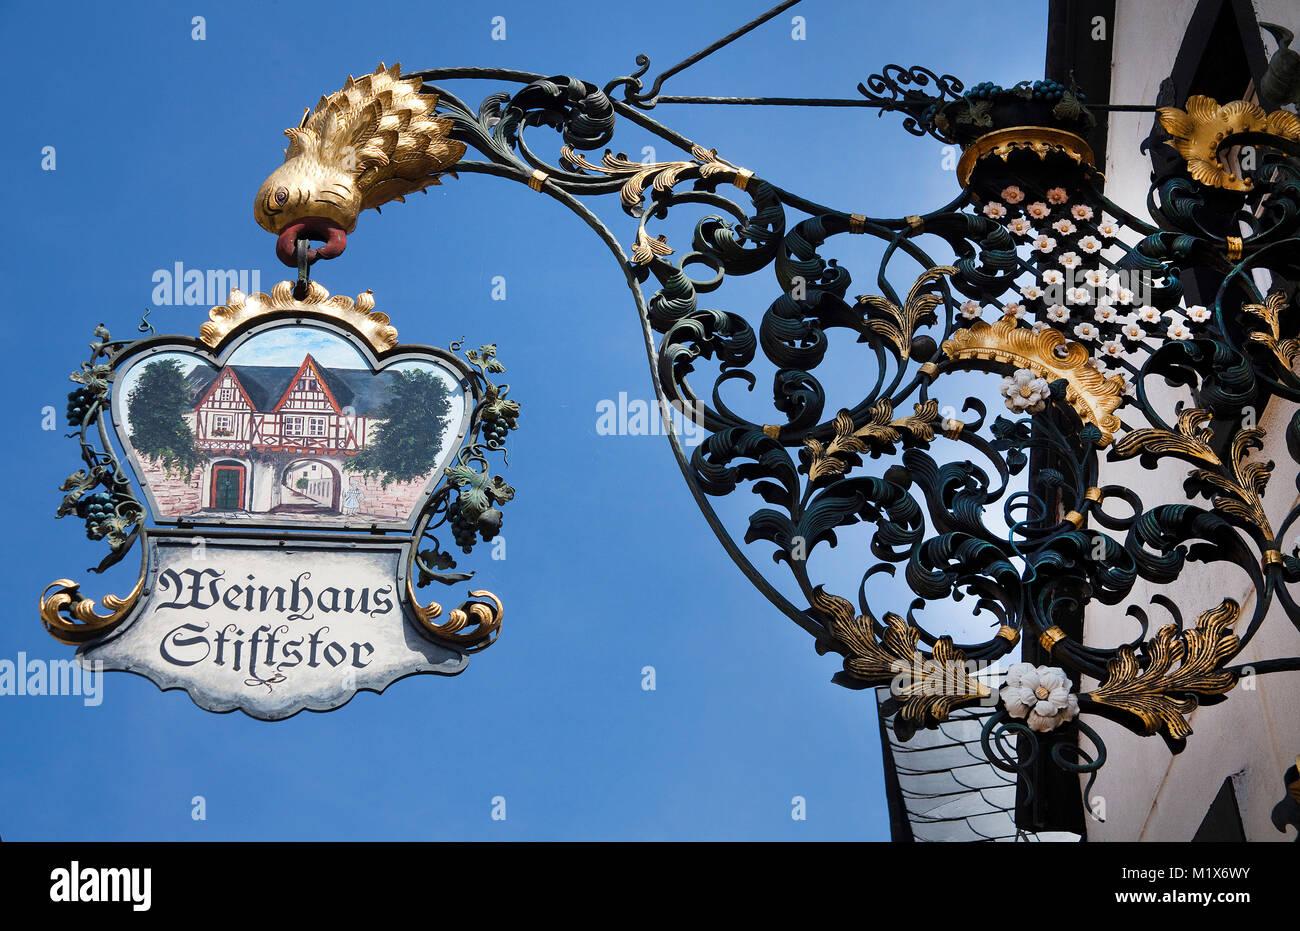 Sign of an inn, wine tavern Stiftstor, Treis-Karden, Moselle river, Rhineland-Palatinate, Germany, Europe Stock Photo